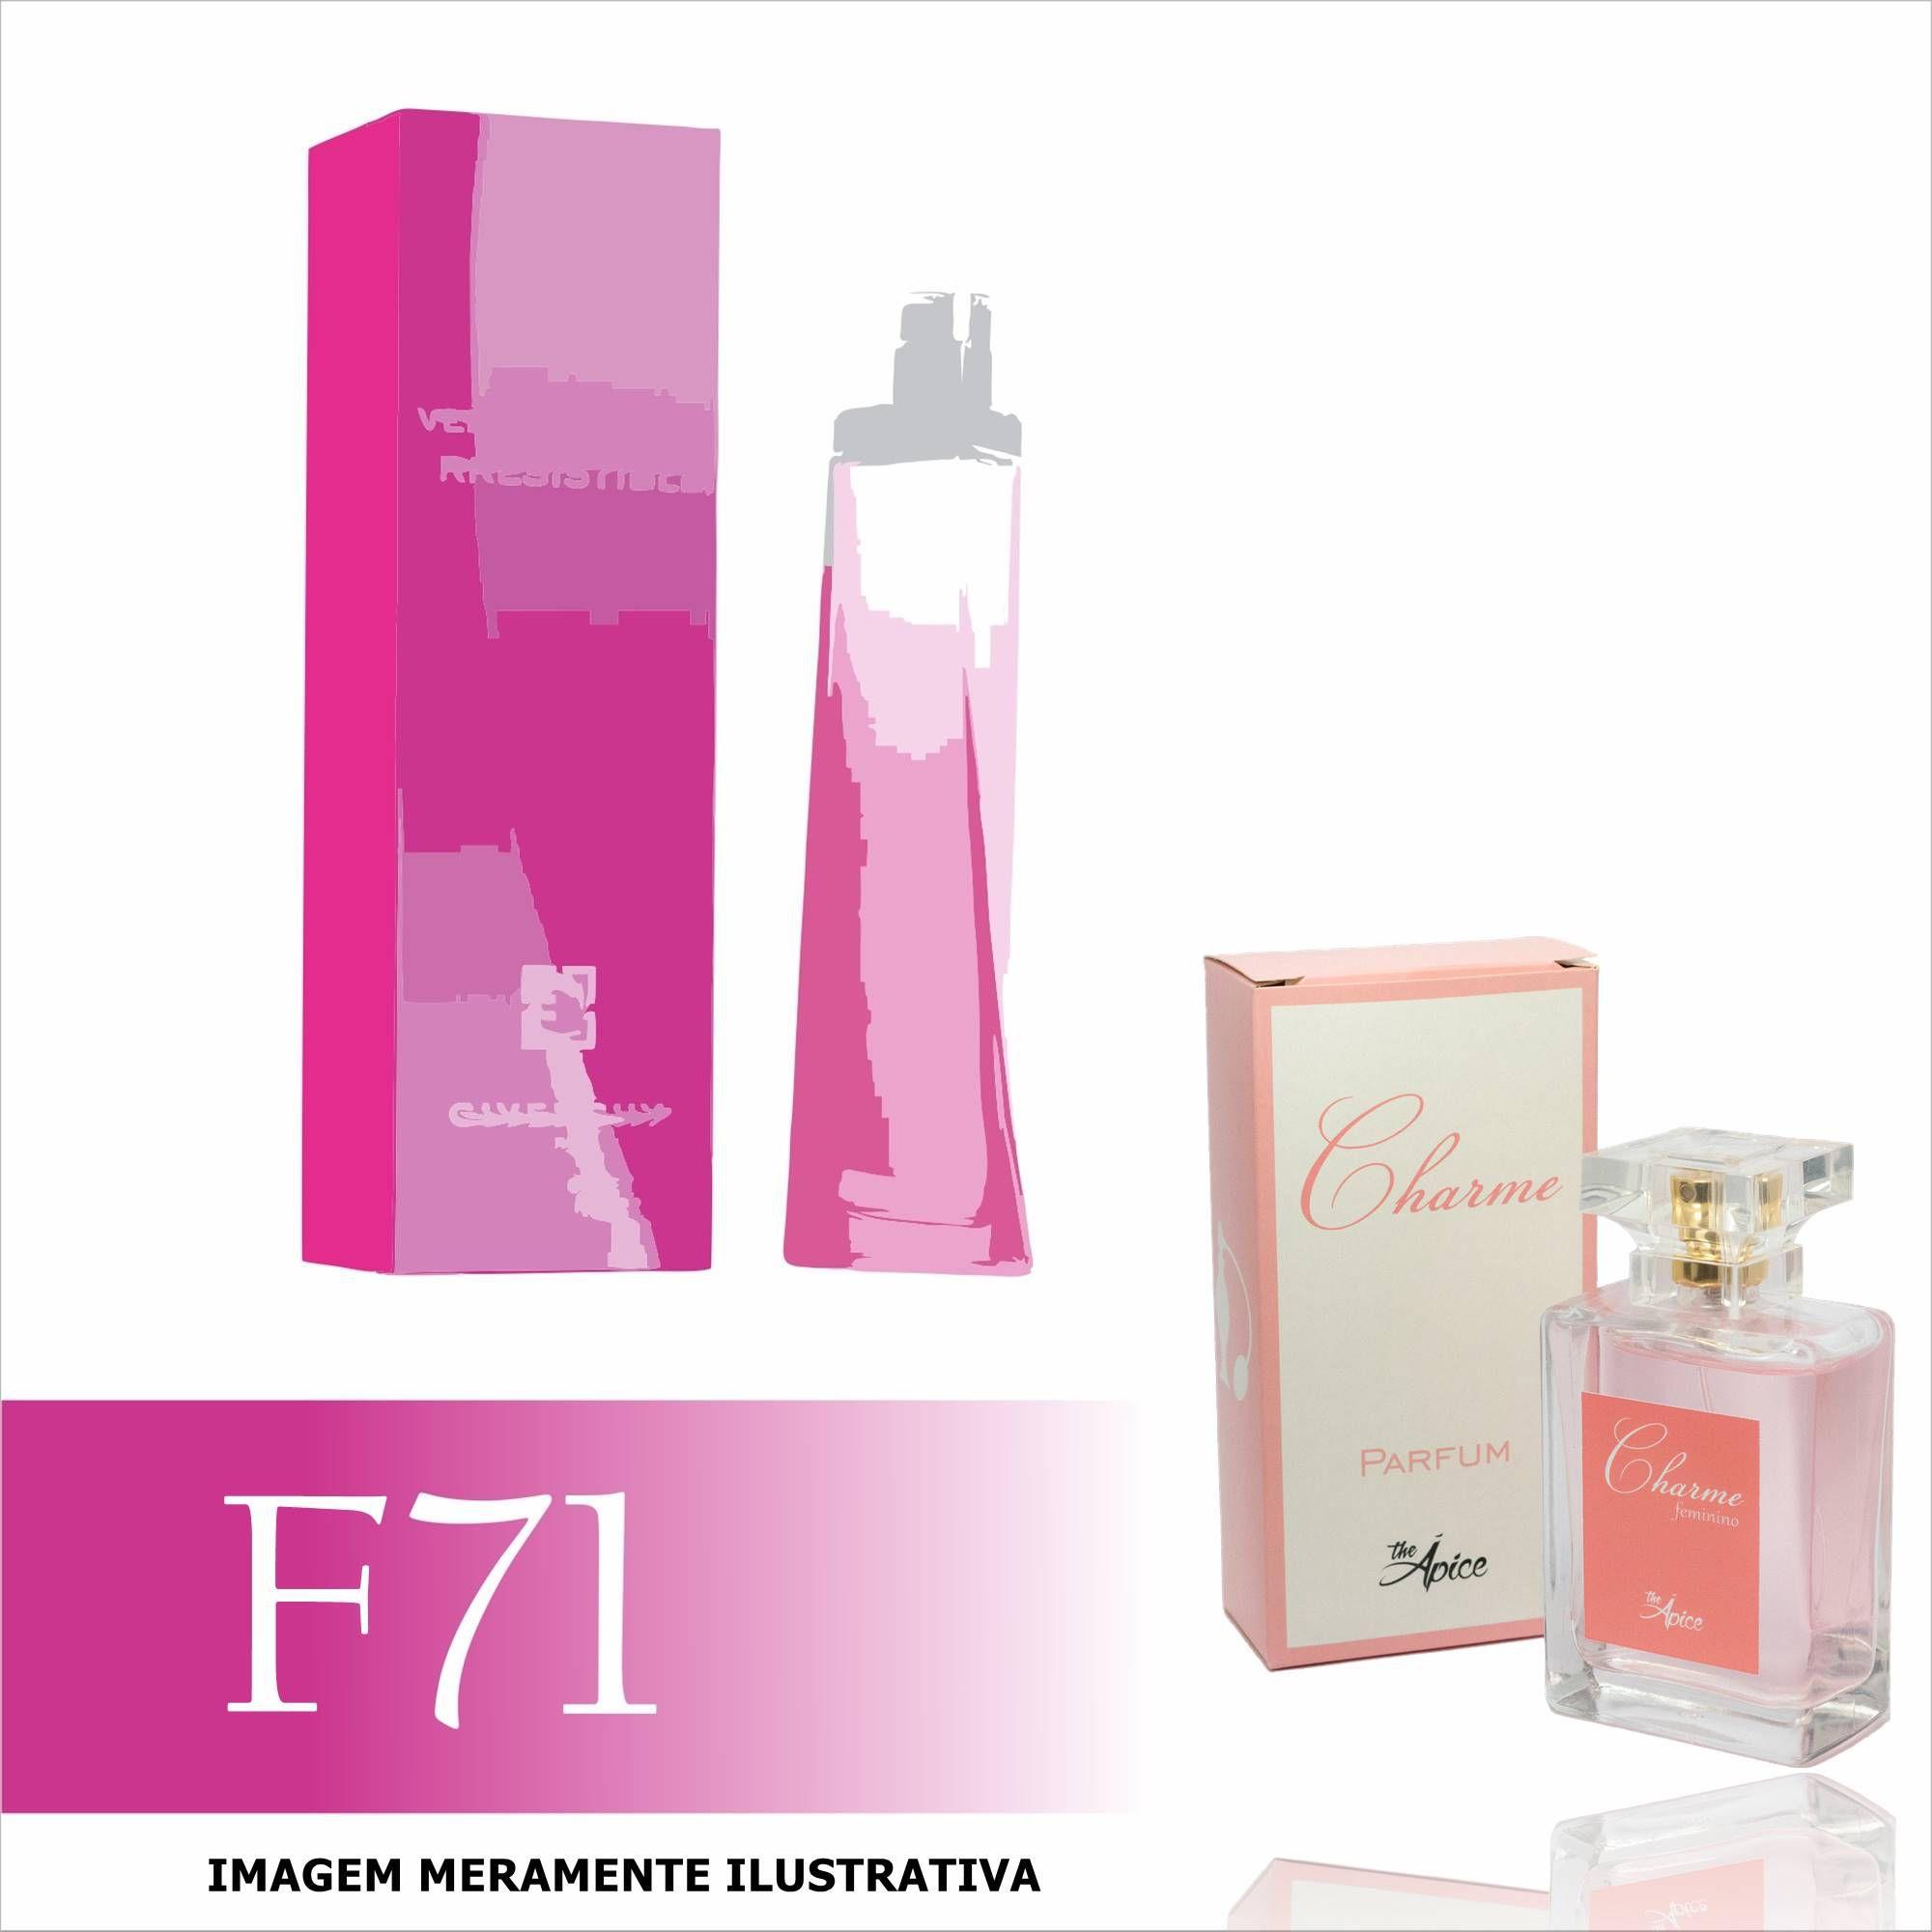 Perfume F71 Inspirado no Very Irrésistible da Givenchy Feminino